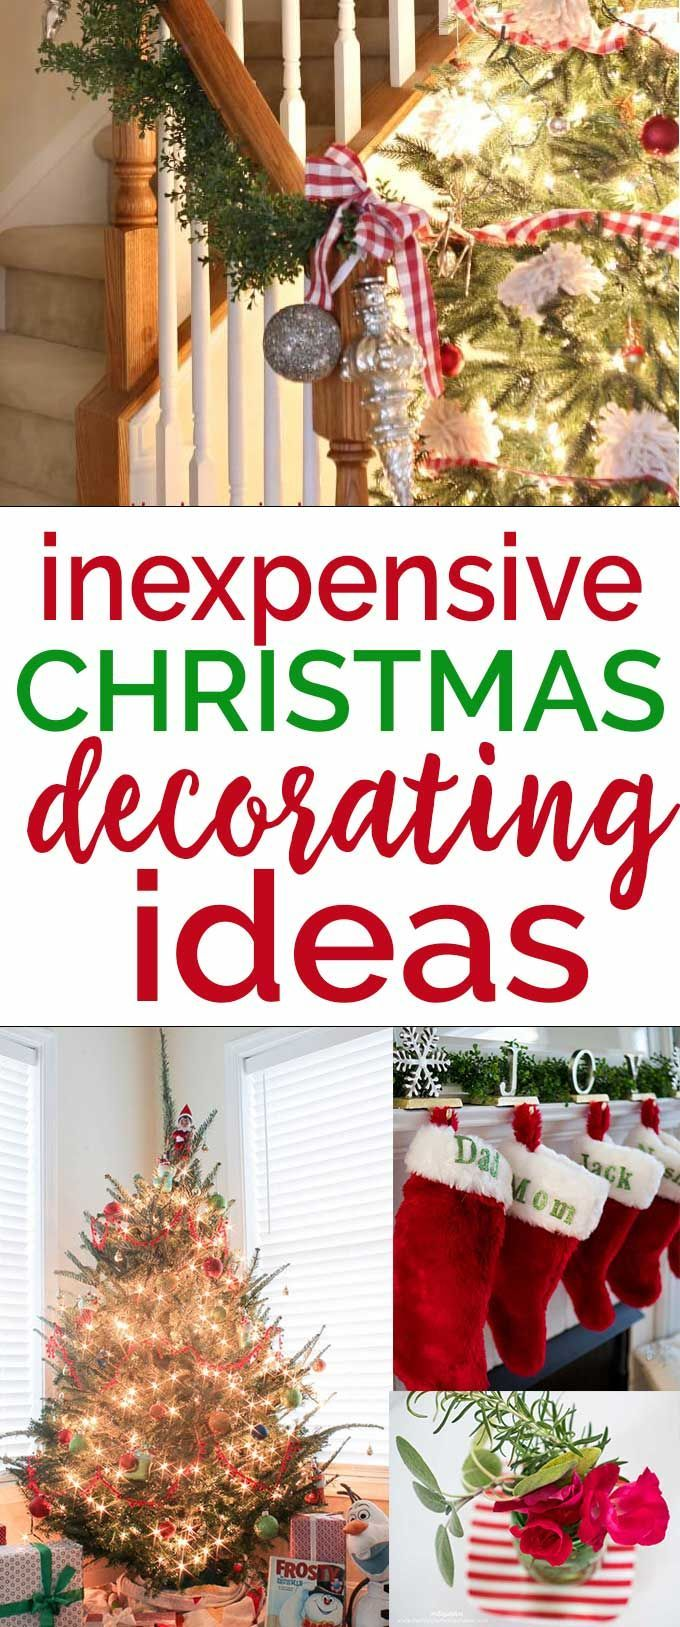 Inexpensive Christmas Decorating Ideas | save money | Pinterest ...